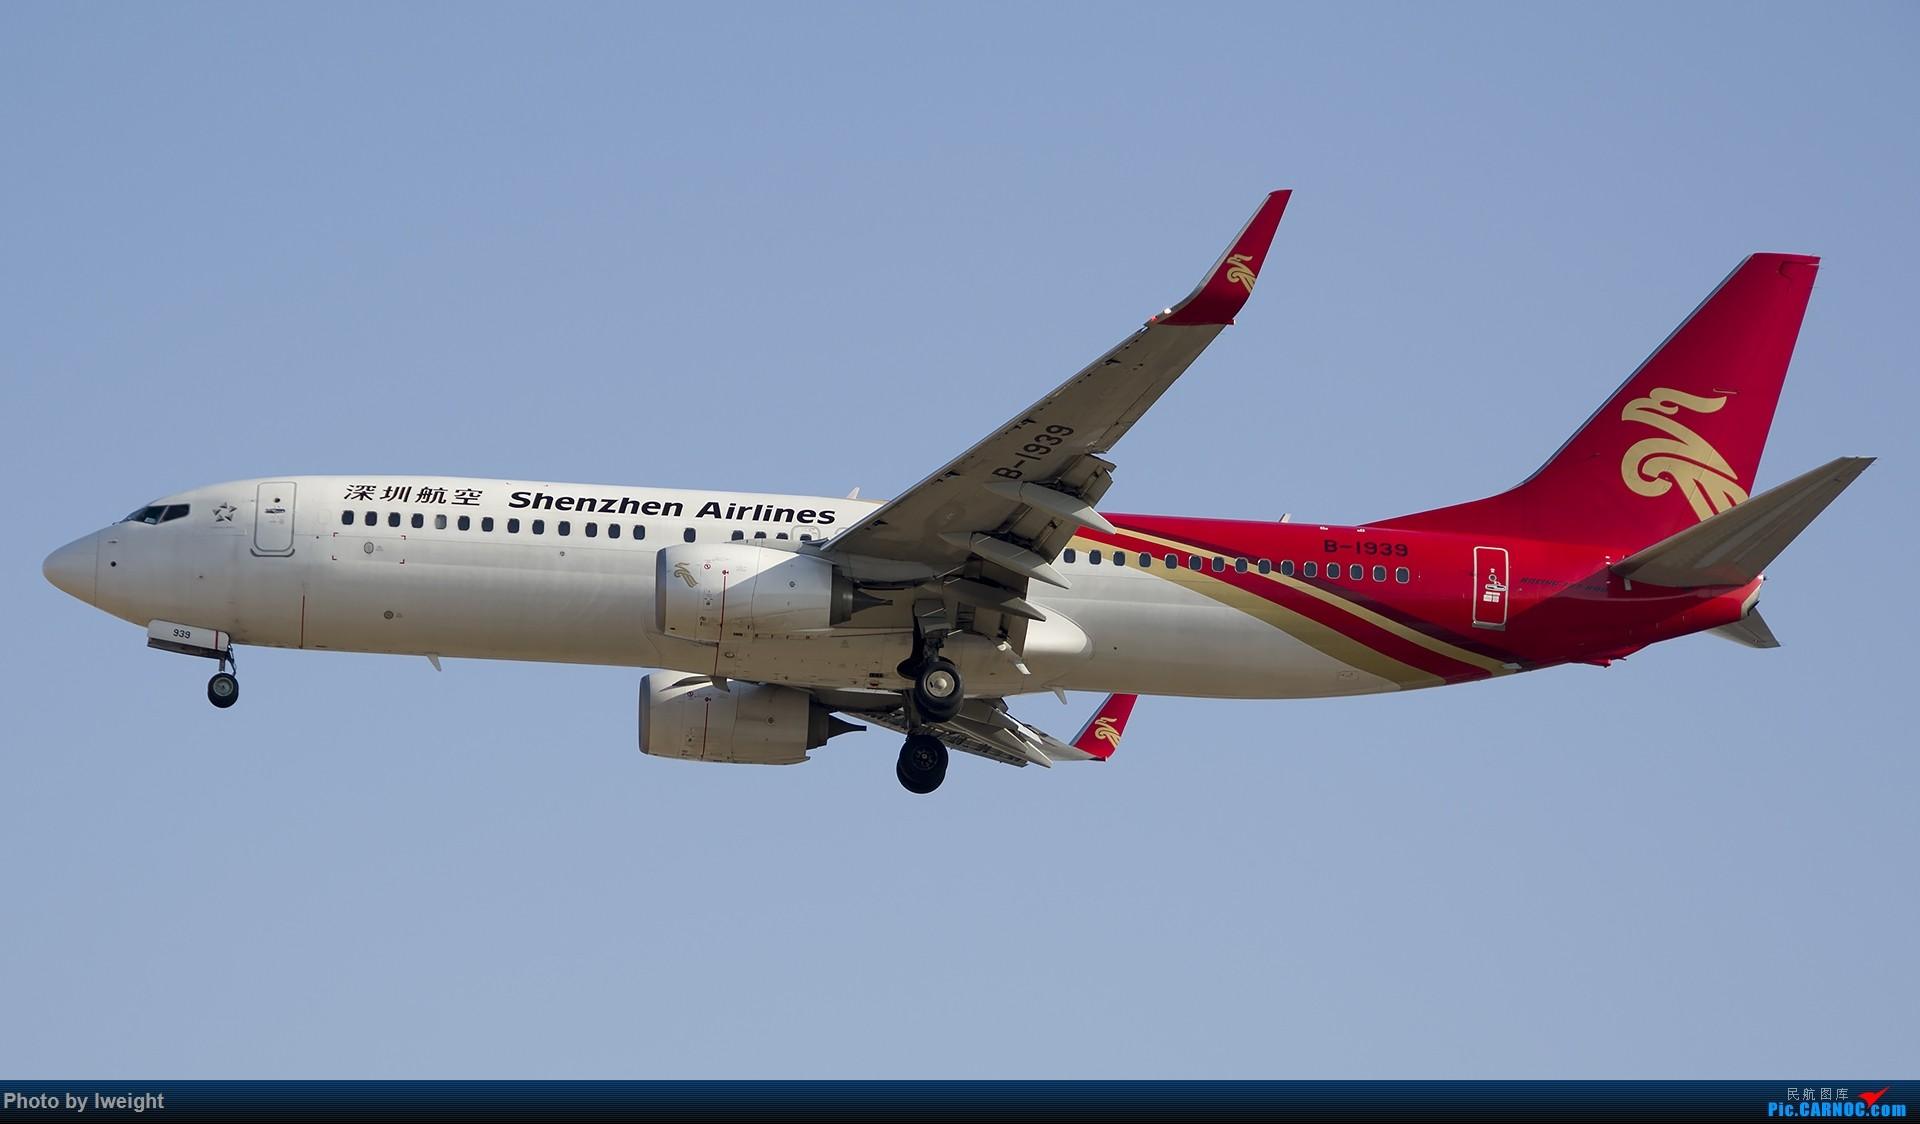 Re:[原创]庆祝升级777,发上今天在首都机场拍的所有飞机【2014-12-14】 BOEING 737-800 B-1939 中国北京首都国际机场